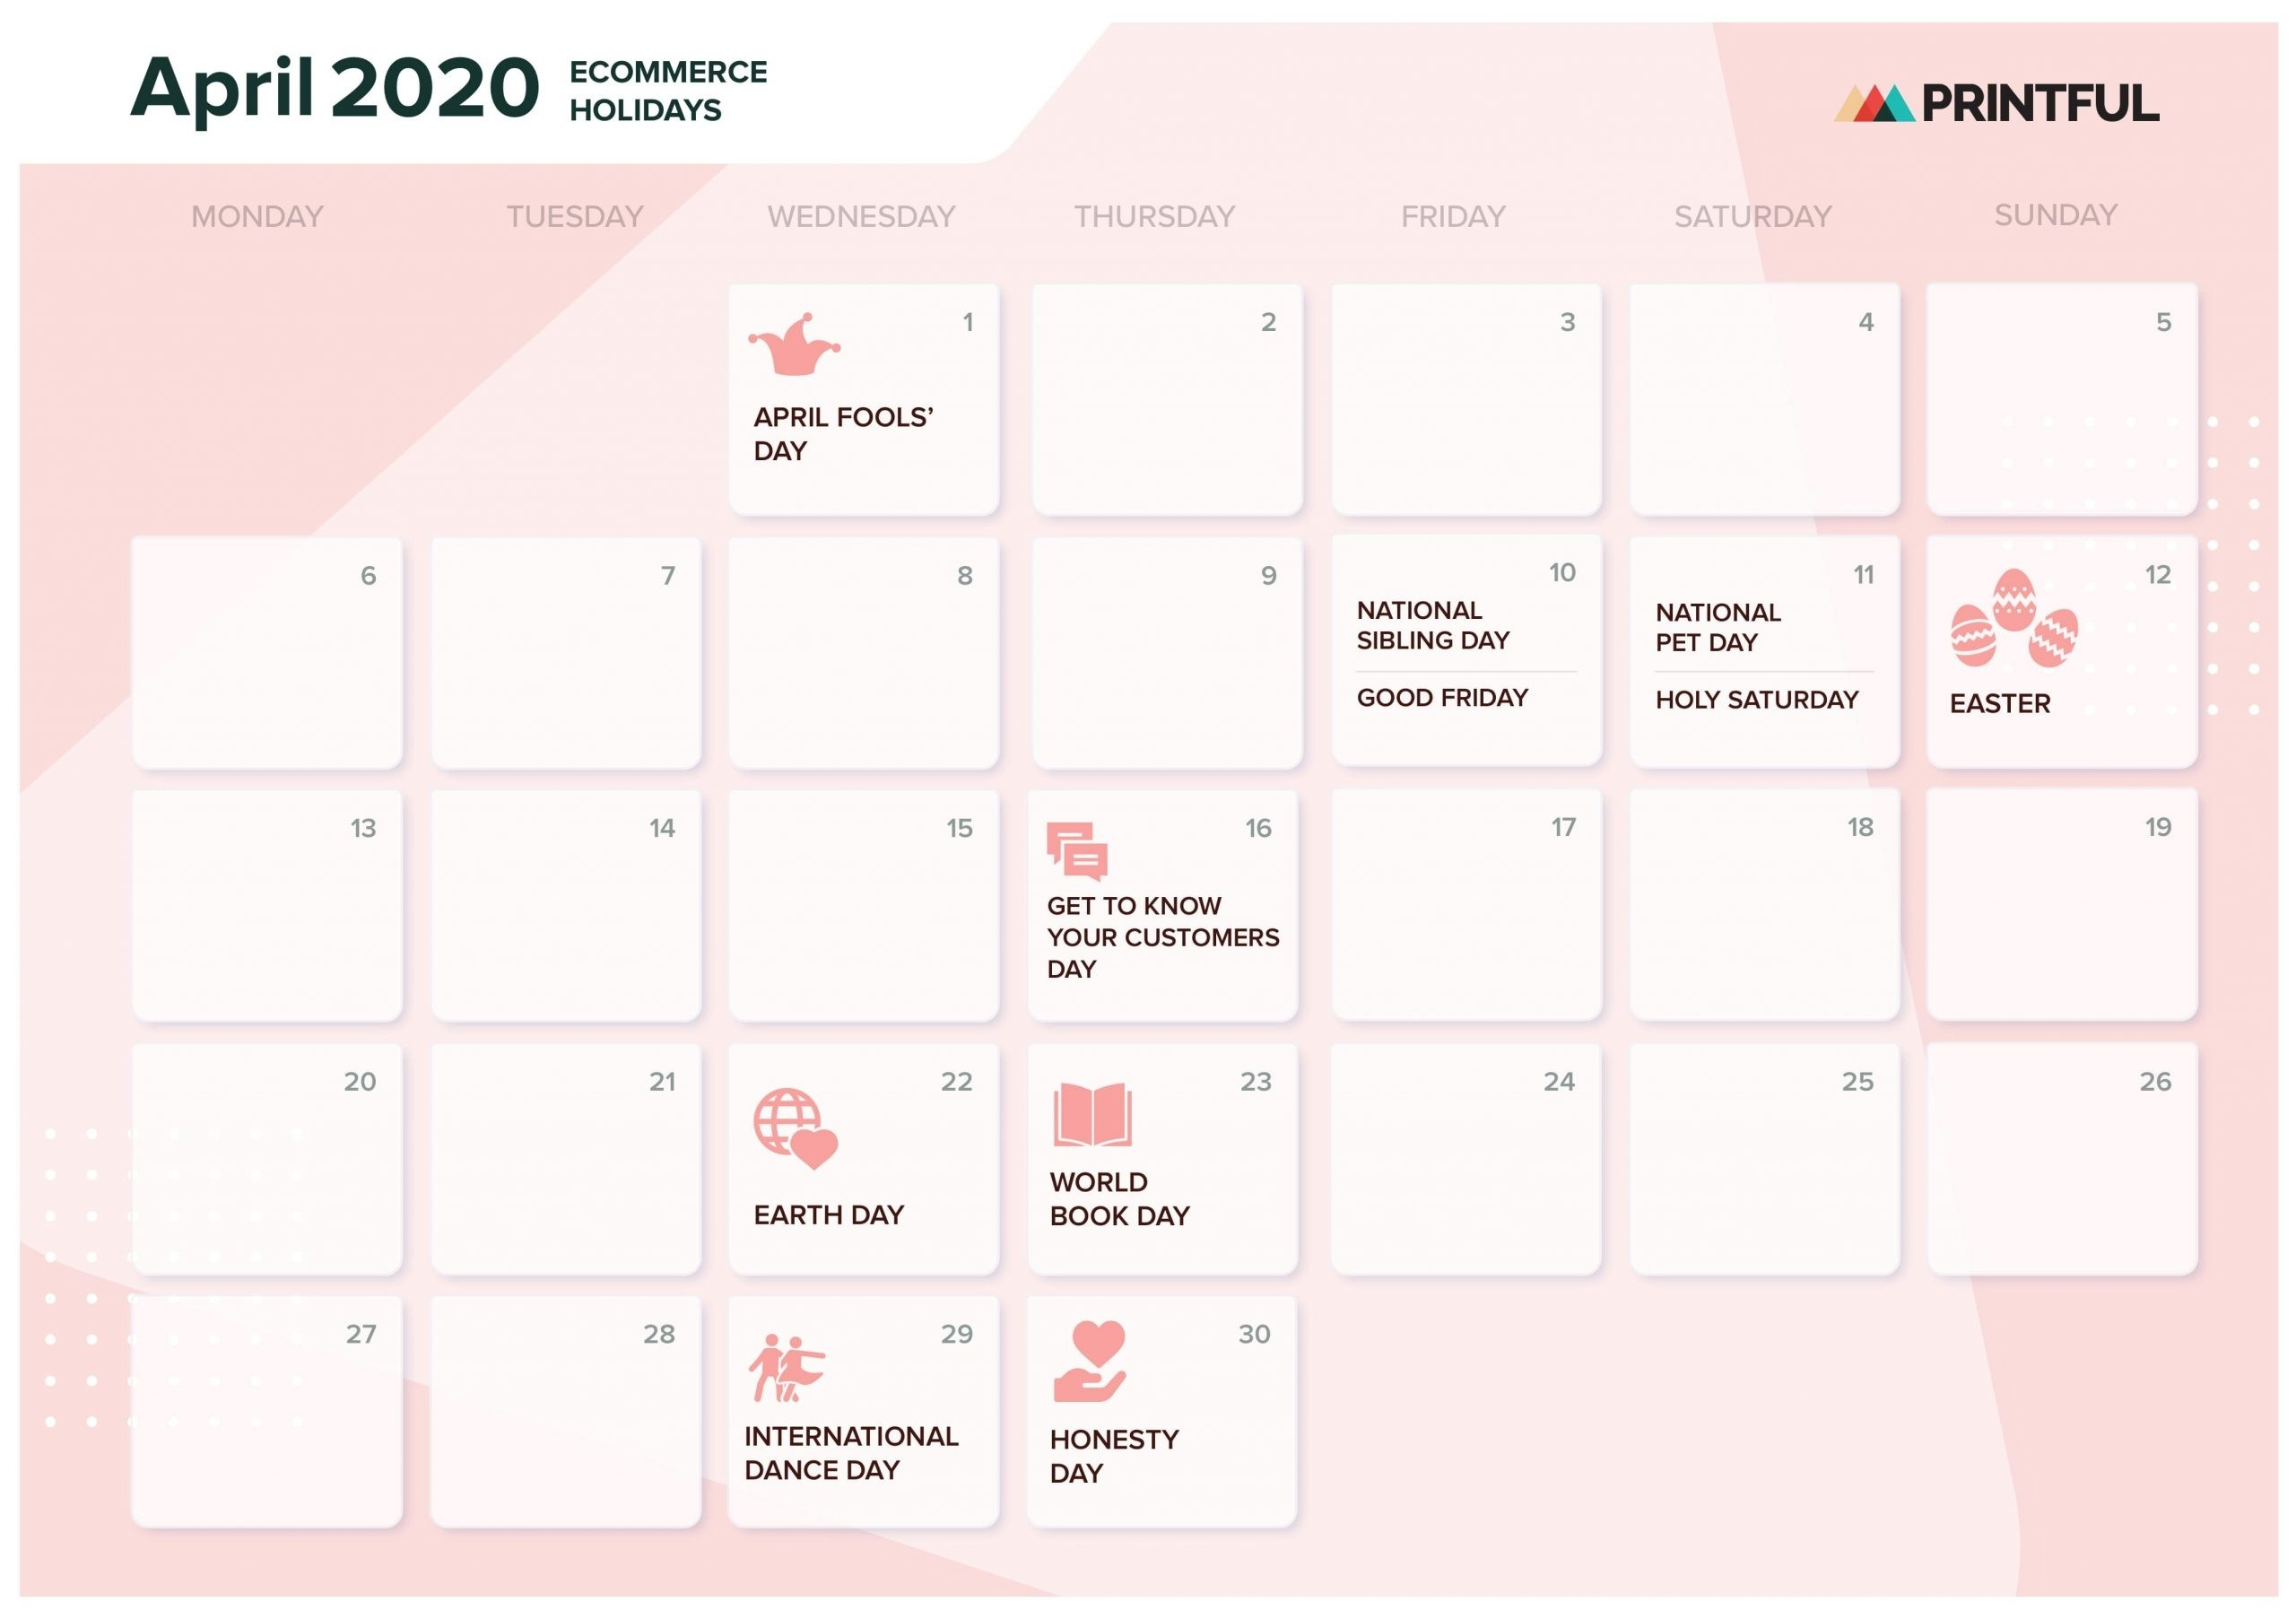 The Ultimate 2020 Ecommerce Holiday Marketing Calendar-Calendar For 2020 Indicating Public Holidays